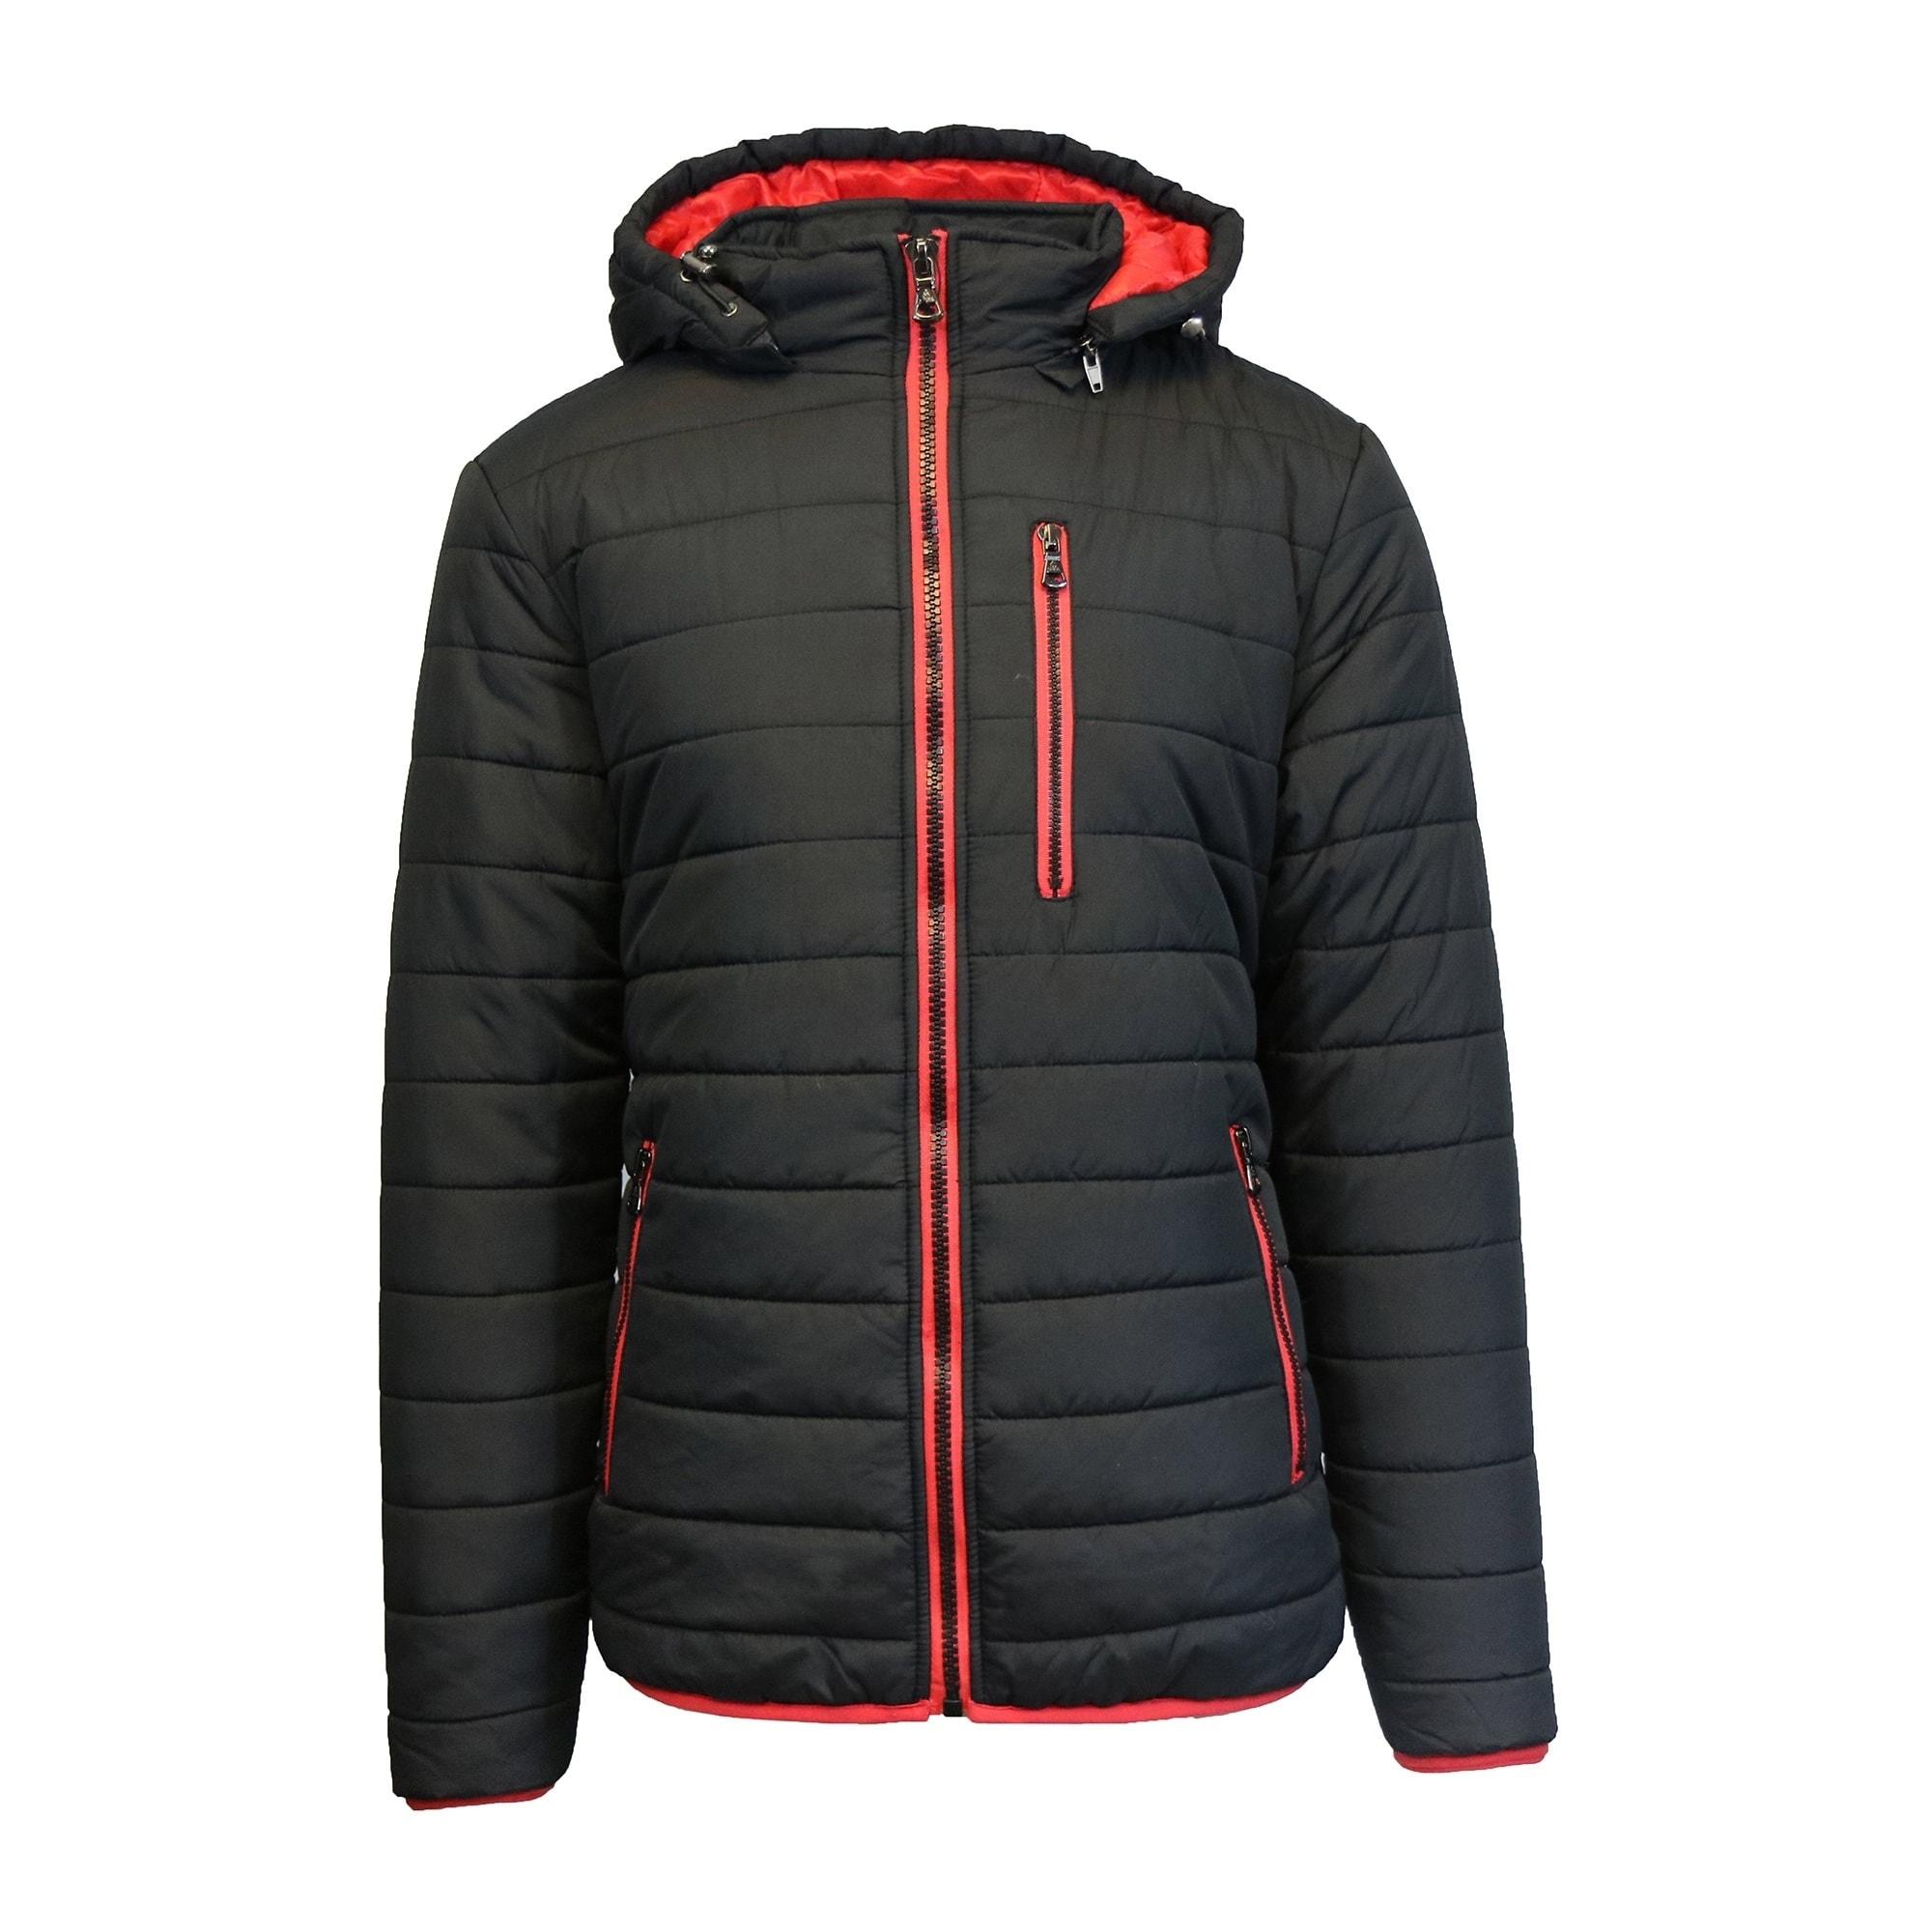 66d397d94 Spire By Galaxy Men's Heavyweight Puffer Jacket with Detachable Hood